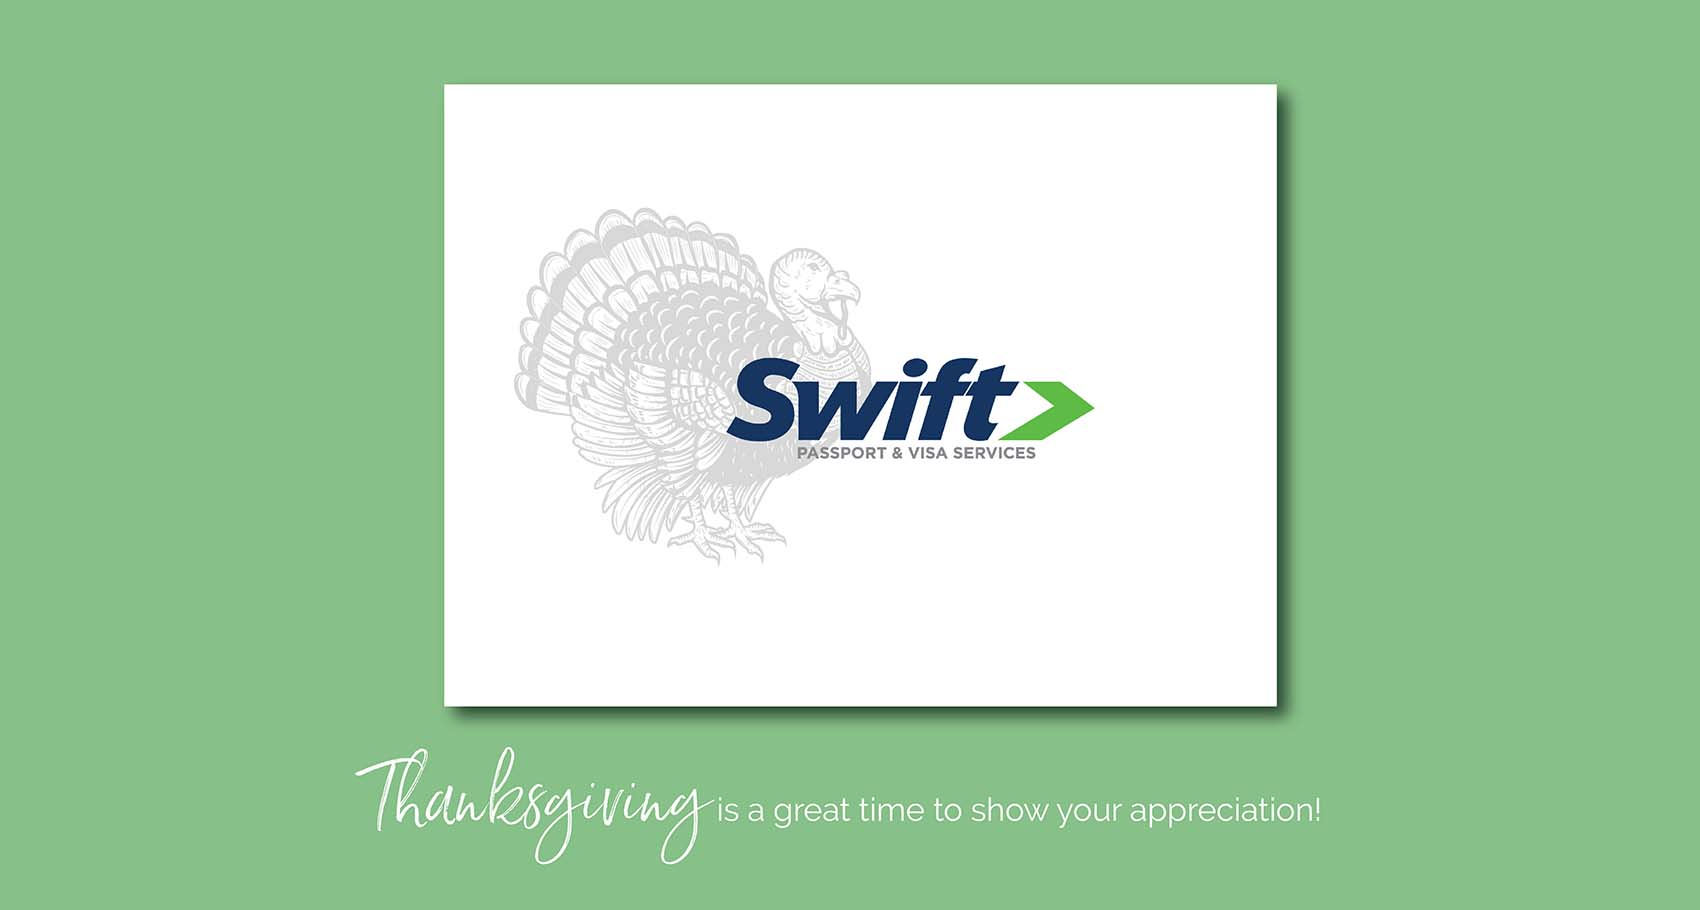 Swift Passport & Visa Services Thanksgiving Holiday Card Design